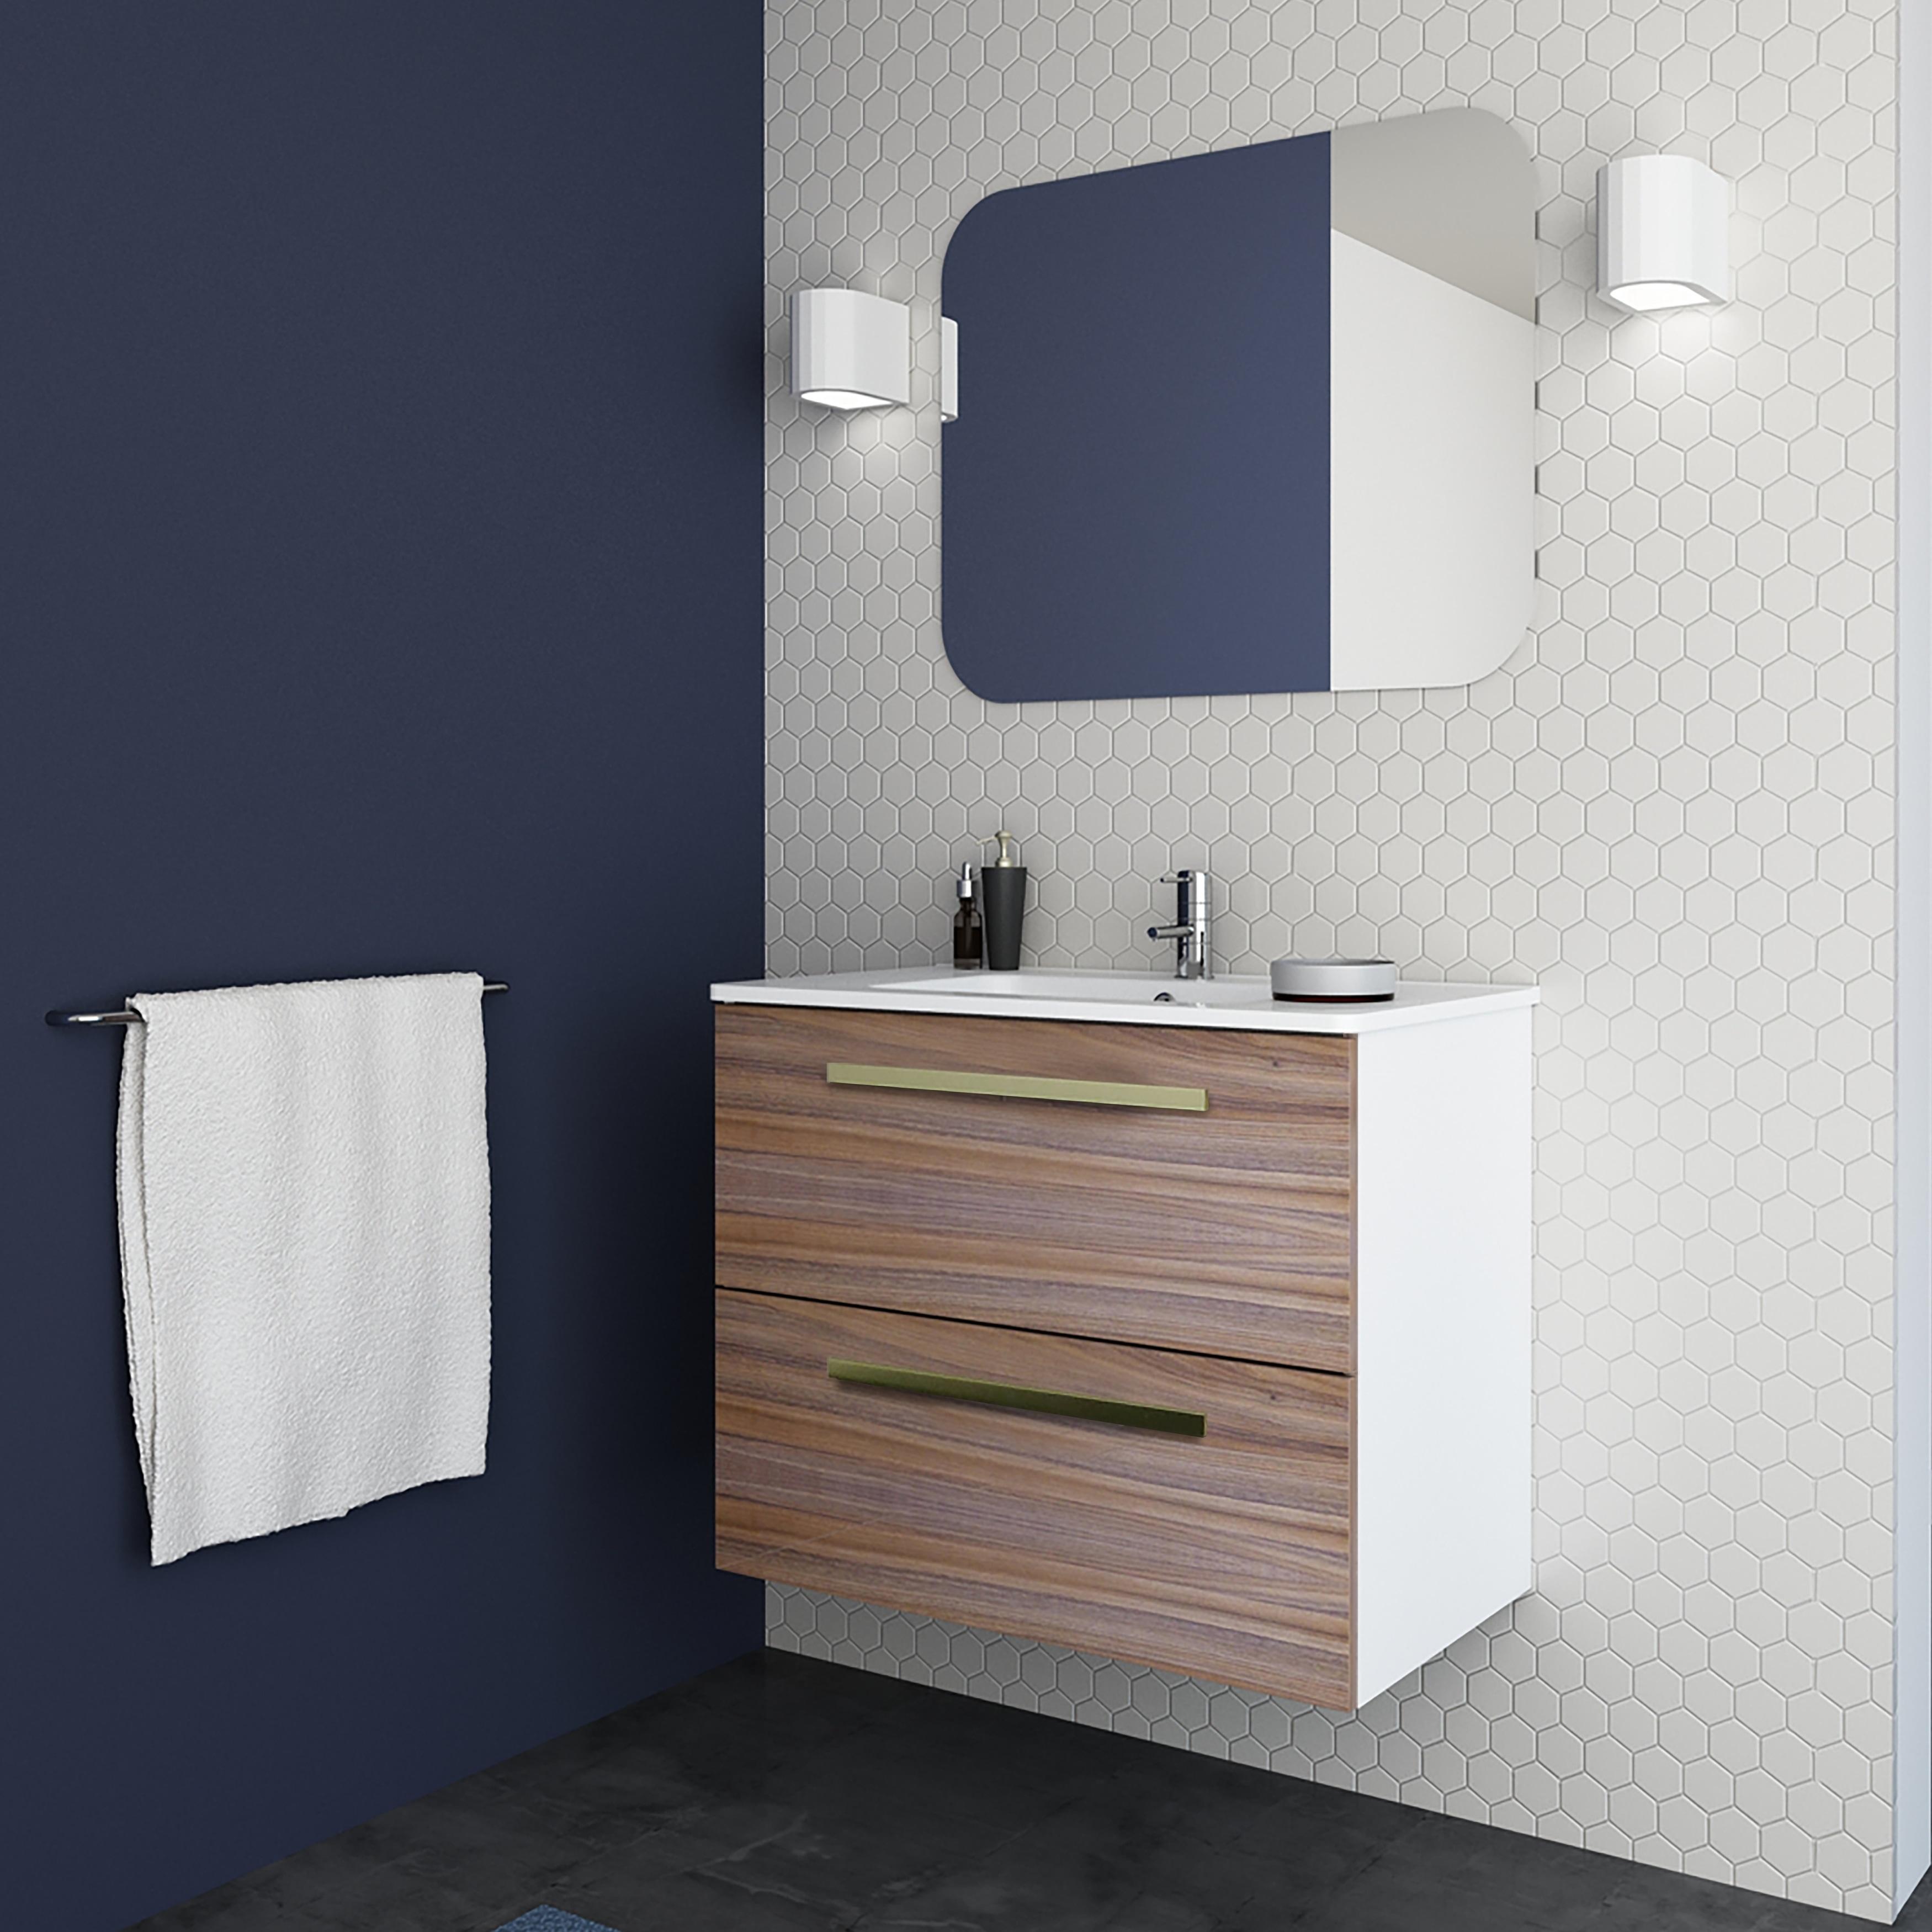 Maine Modern Bathroom Vanity Cabinet Set Oak Wood Looking Finish On Sale Overstock 30546831